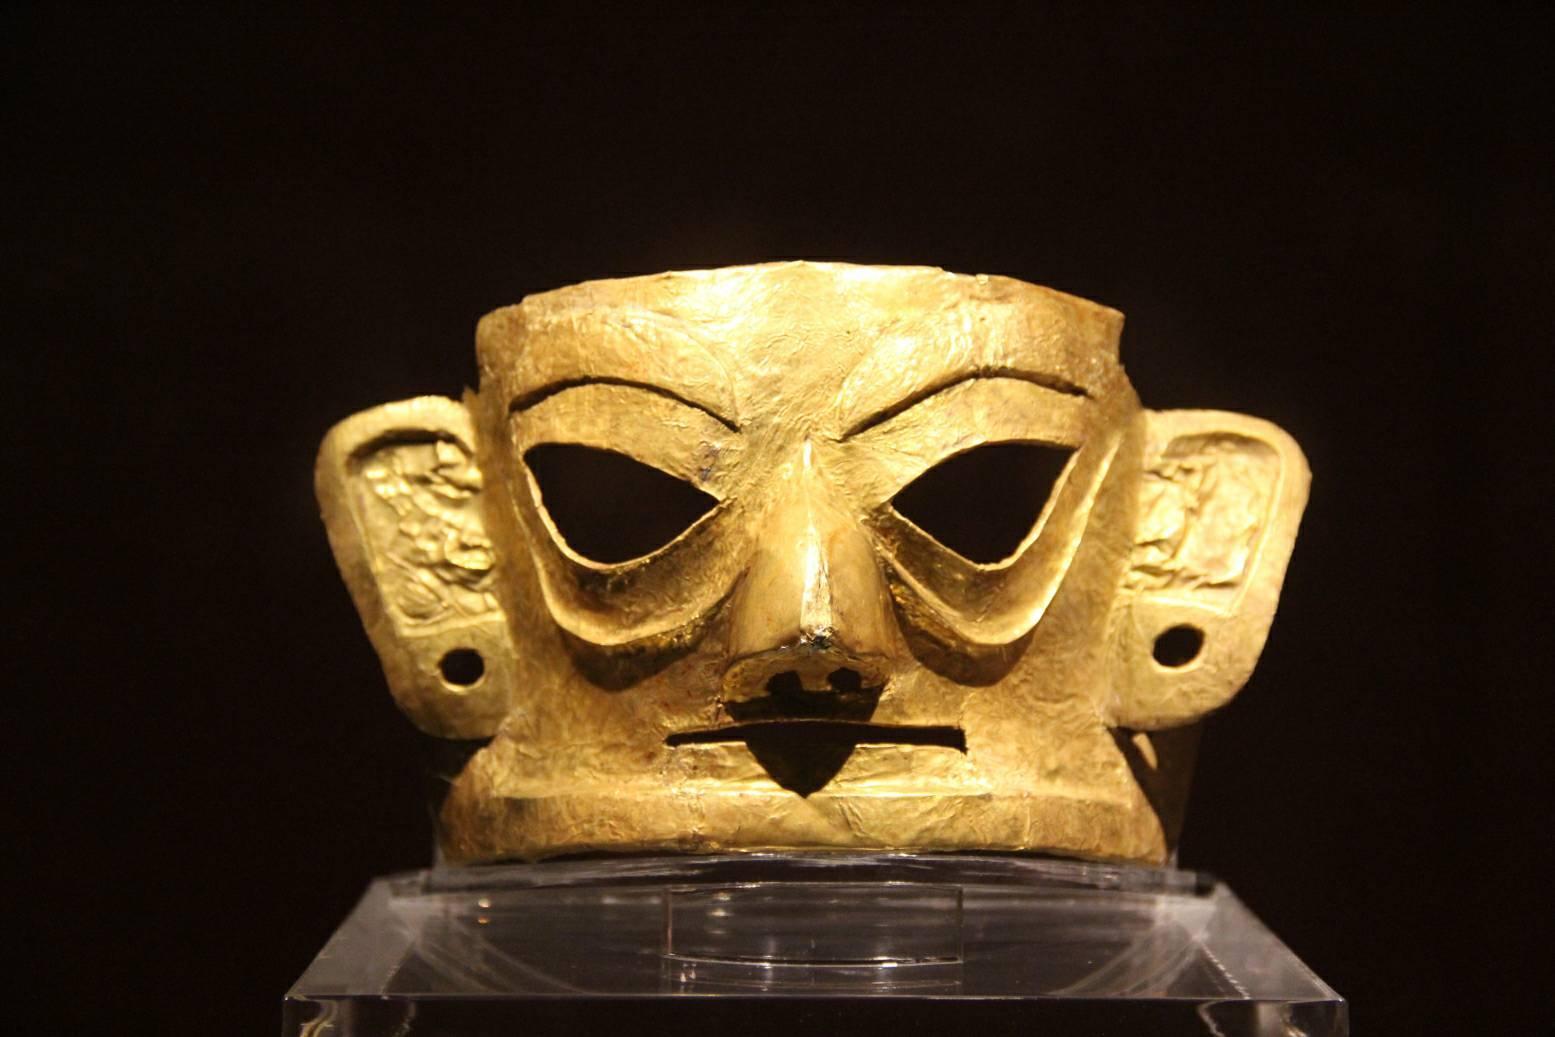 Golden Mask in Jinsha Site Museum, Chengdu City, Sichuan Province